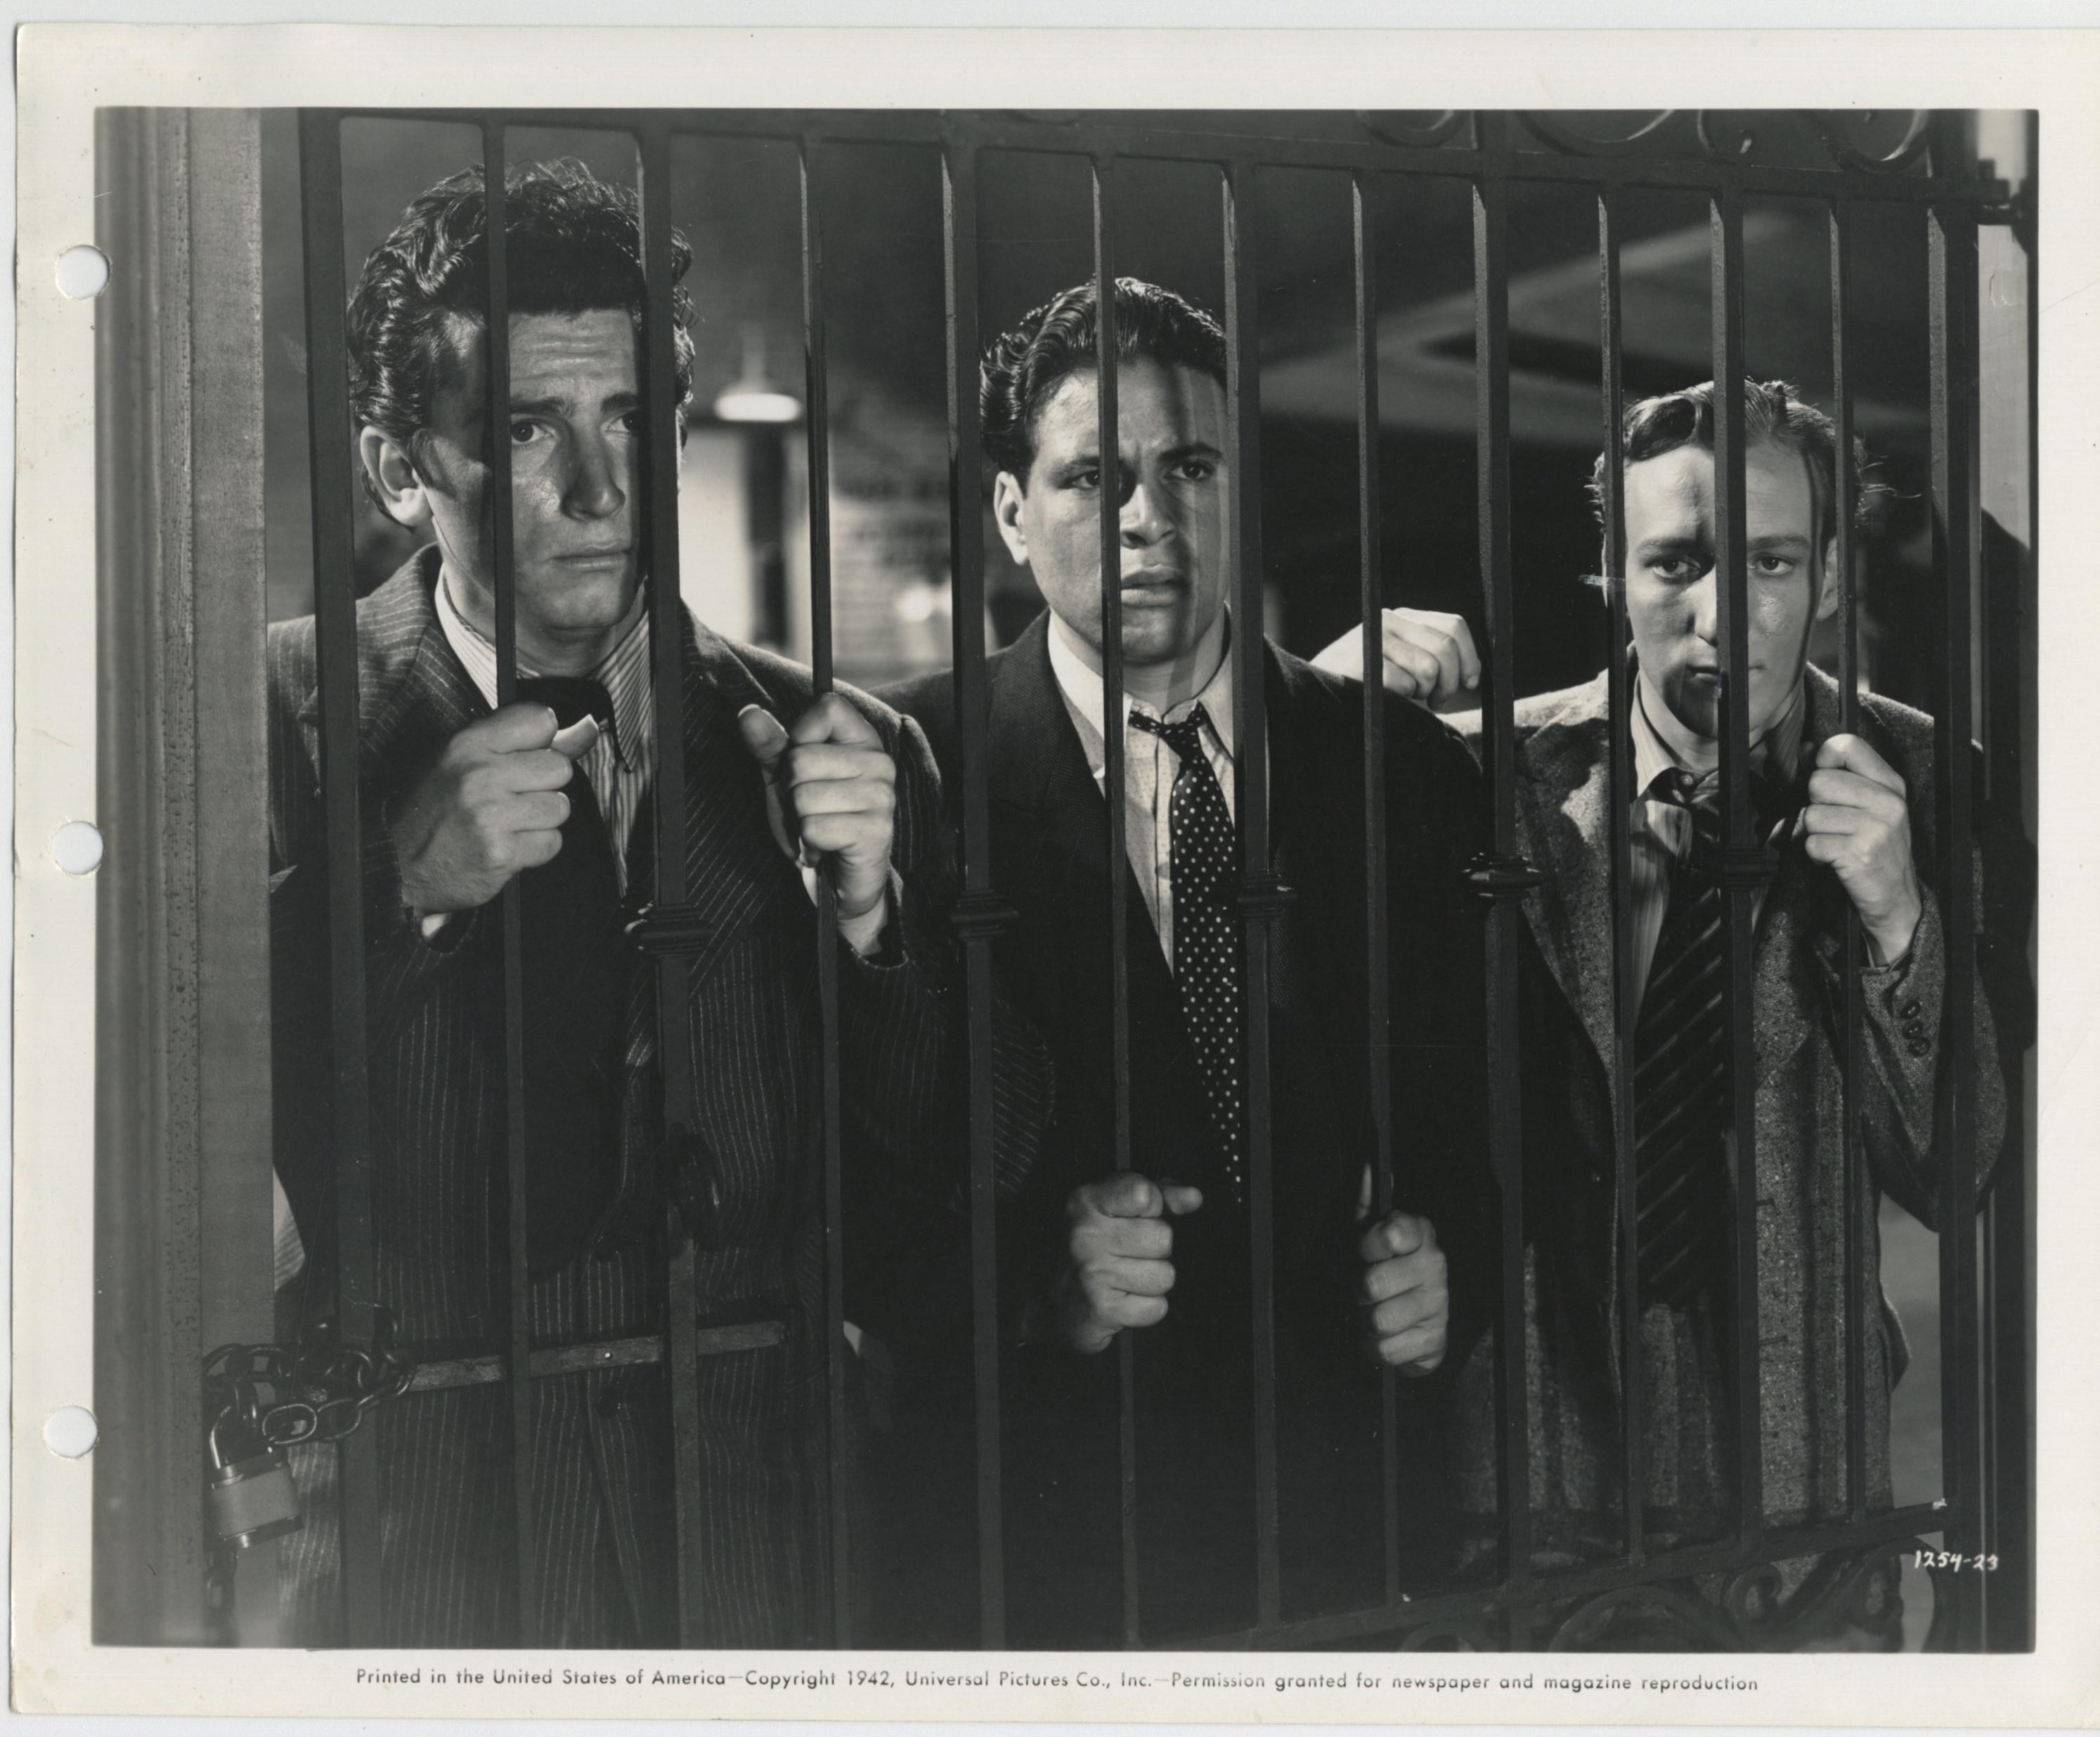 Gabriel Dell, Huntz Hall, and Bernard Punsly in Mug Town (1942)